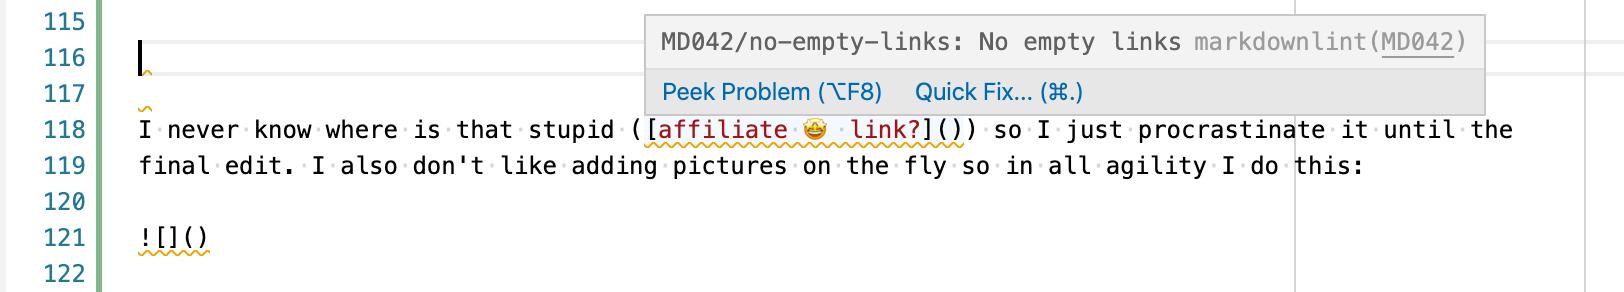 markdownlint validation example